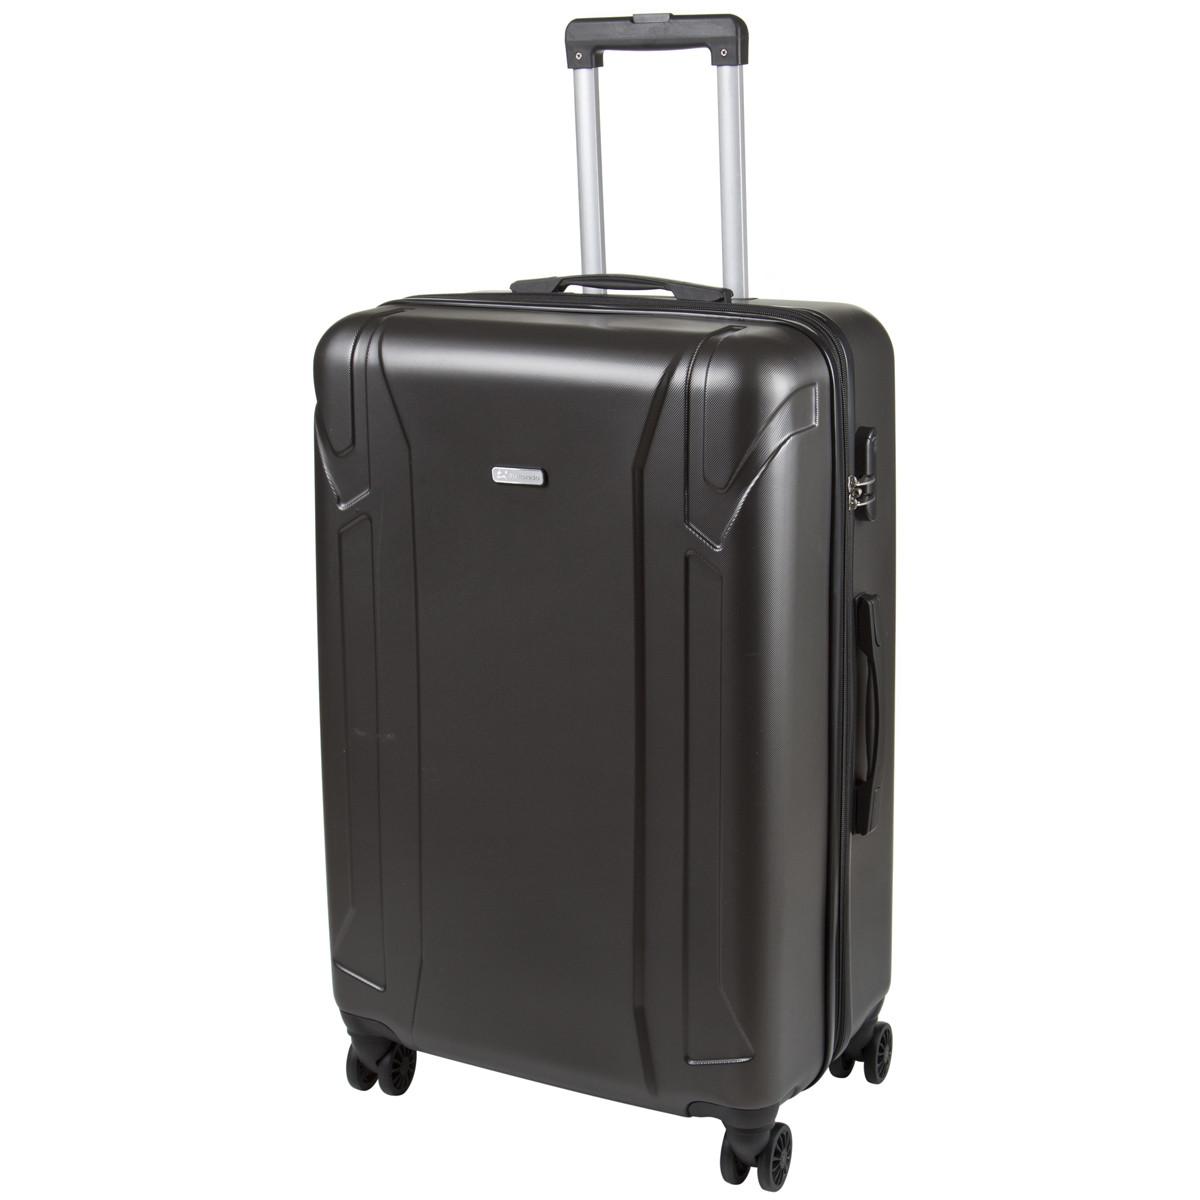 Чемодан большой с расширением пластик ABS тёмно-серый OULANDO 4 колеса 47х72х29(+3)  ксЛ722-28тсер